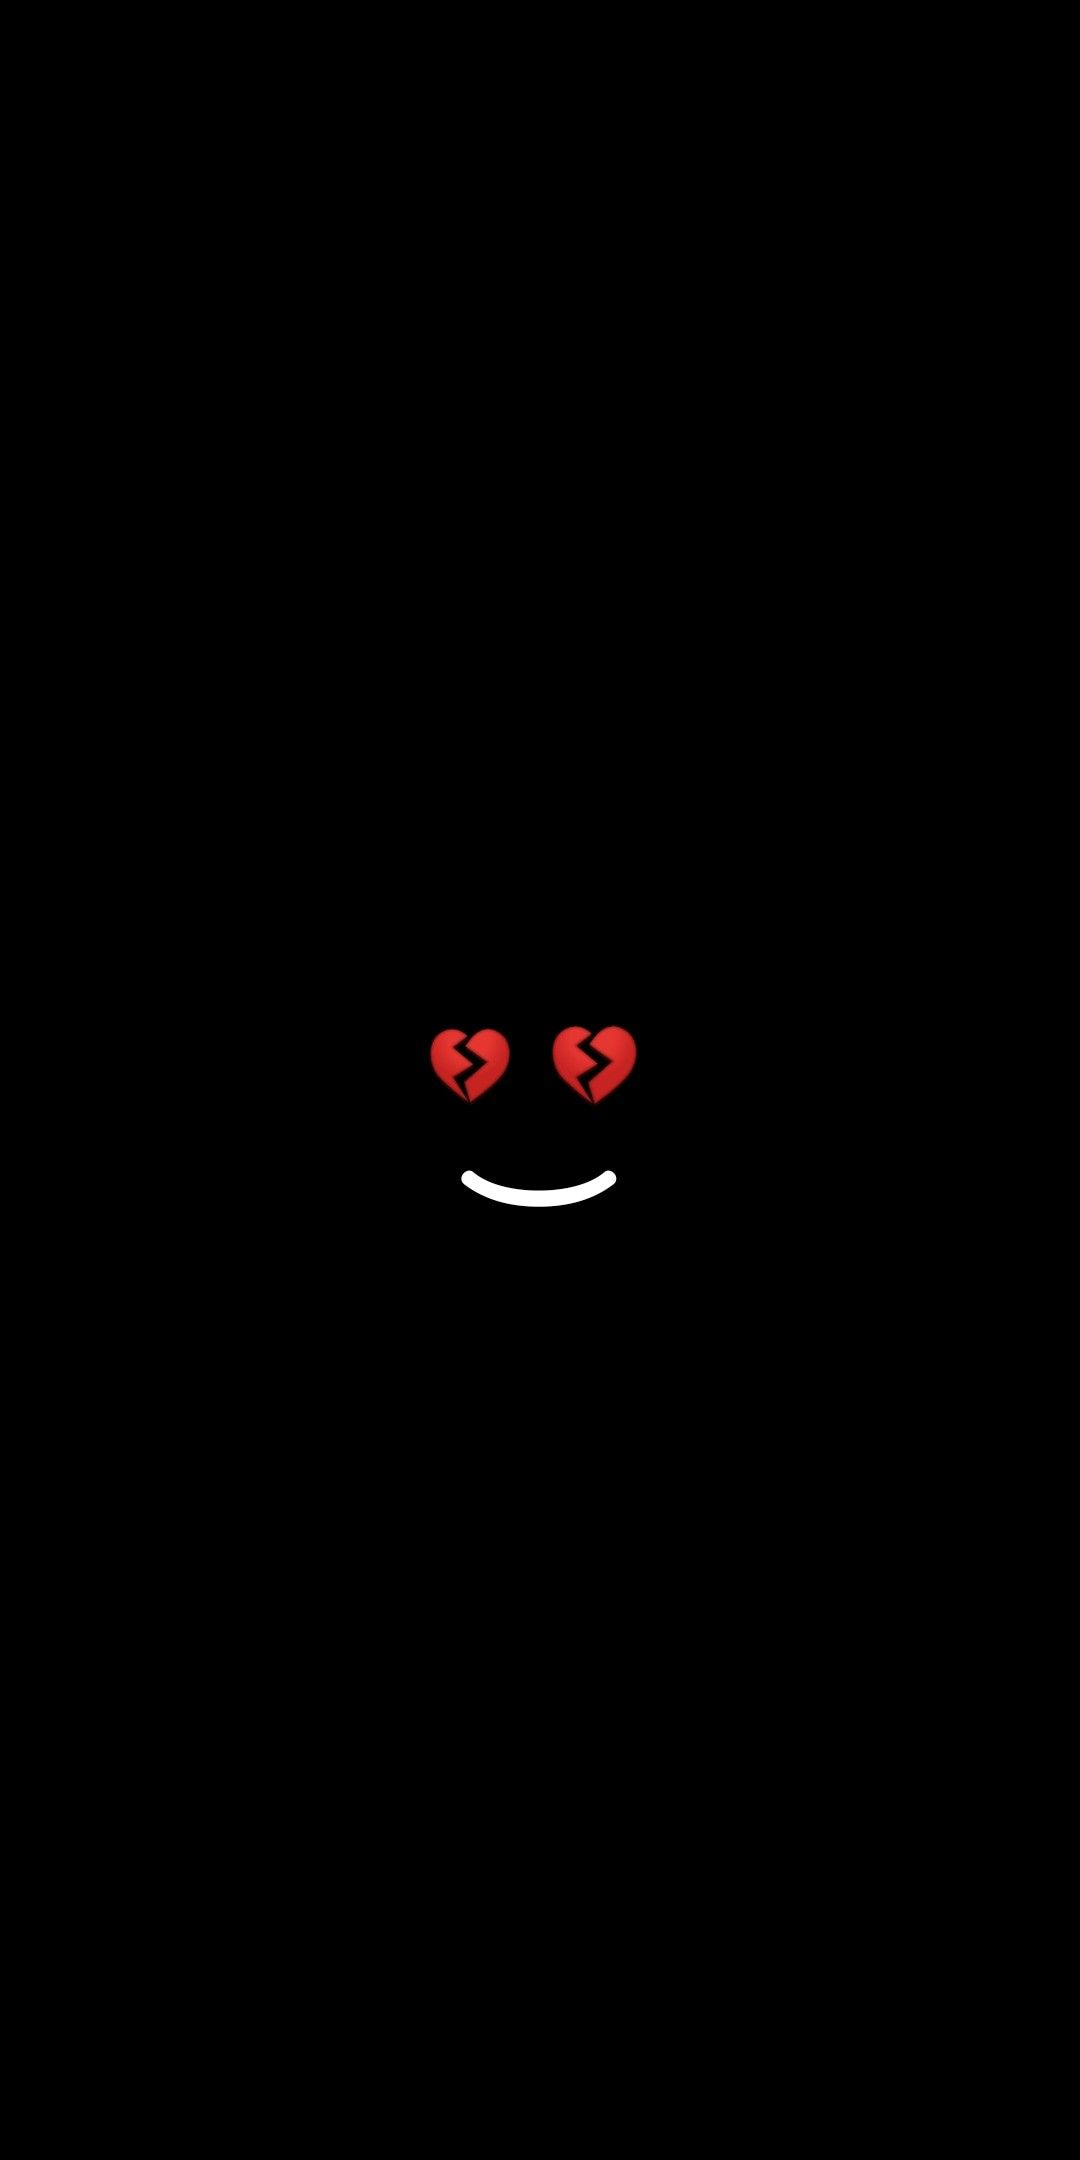 Im Fine Black Wallpaper Broken Heart Wallpaper Glitch Wallpaper Heart Wallpaper